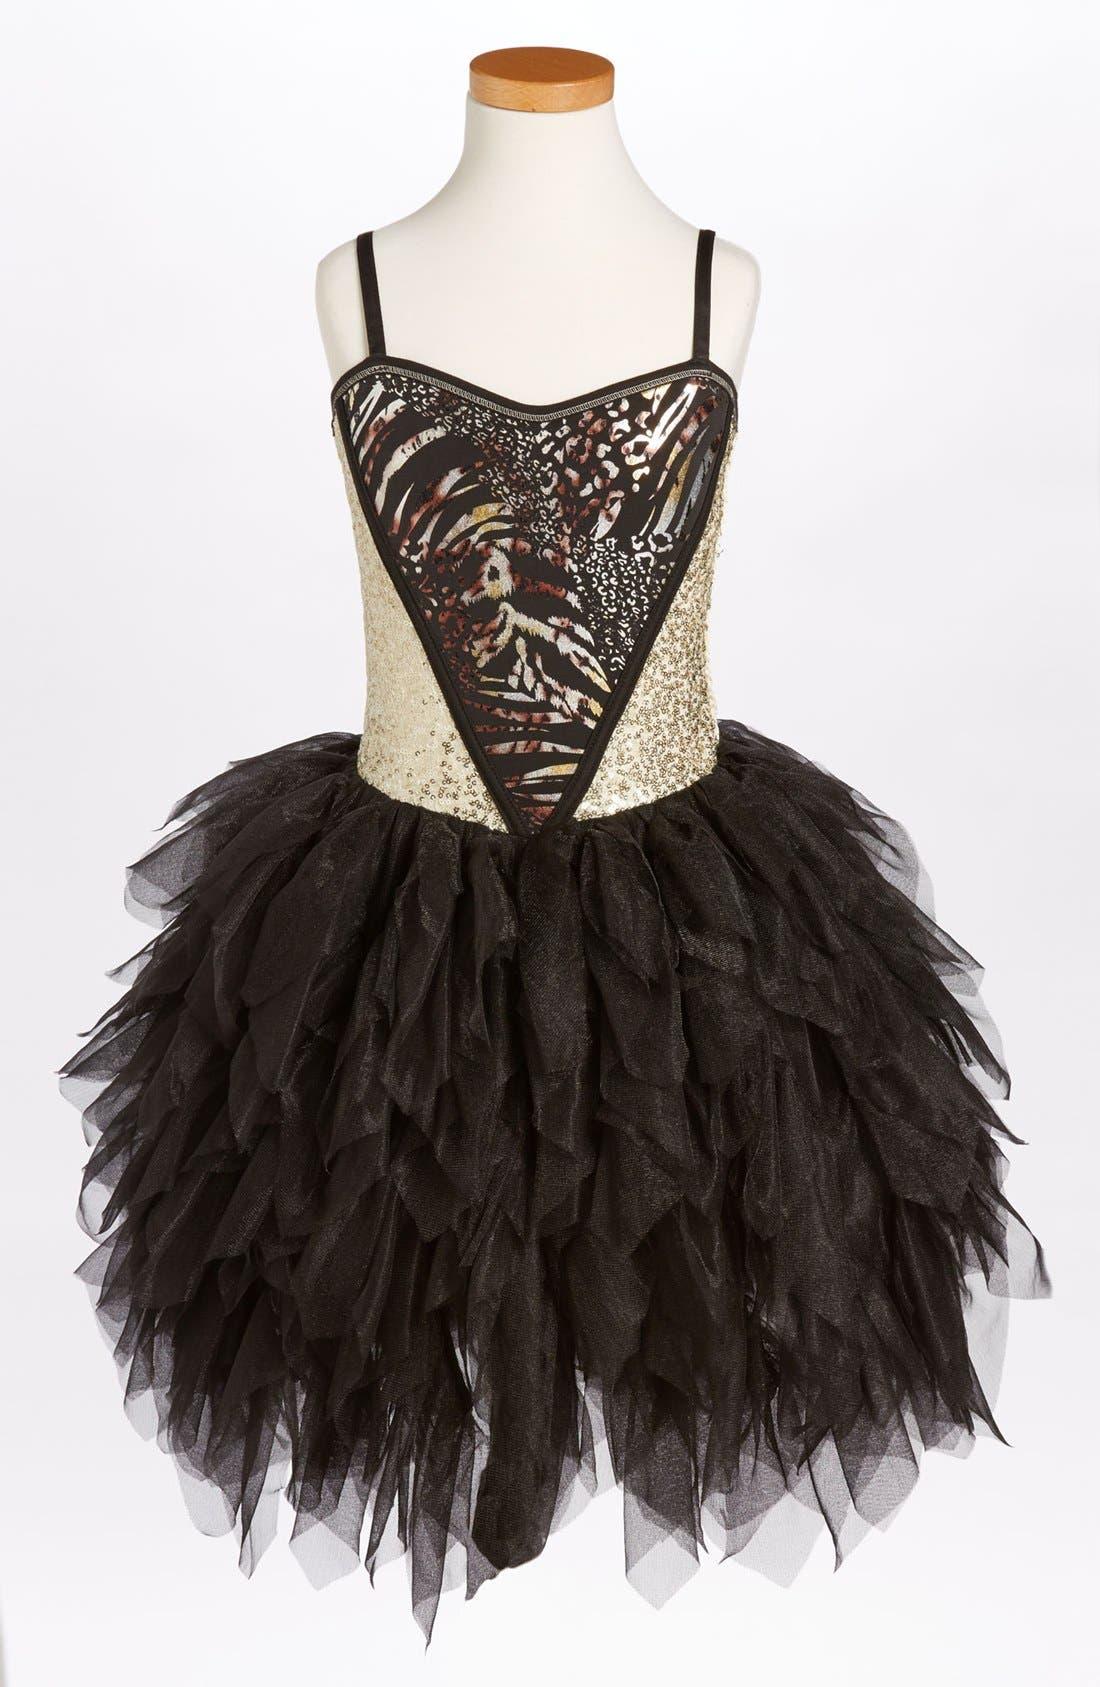 Alternate Image 1 Selected - Ooh! La, La! Couture 'Wow - Metallic' Dress (Big Girls) (Online Only)